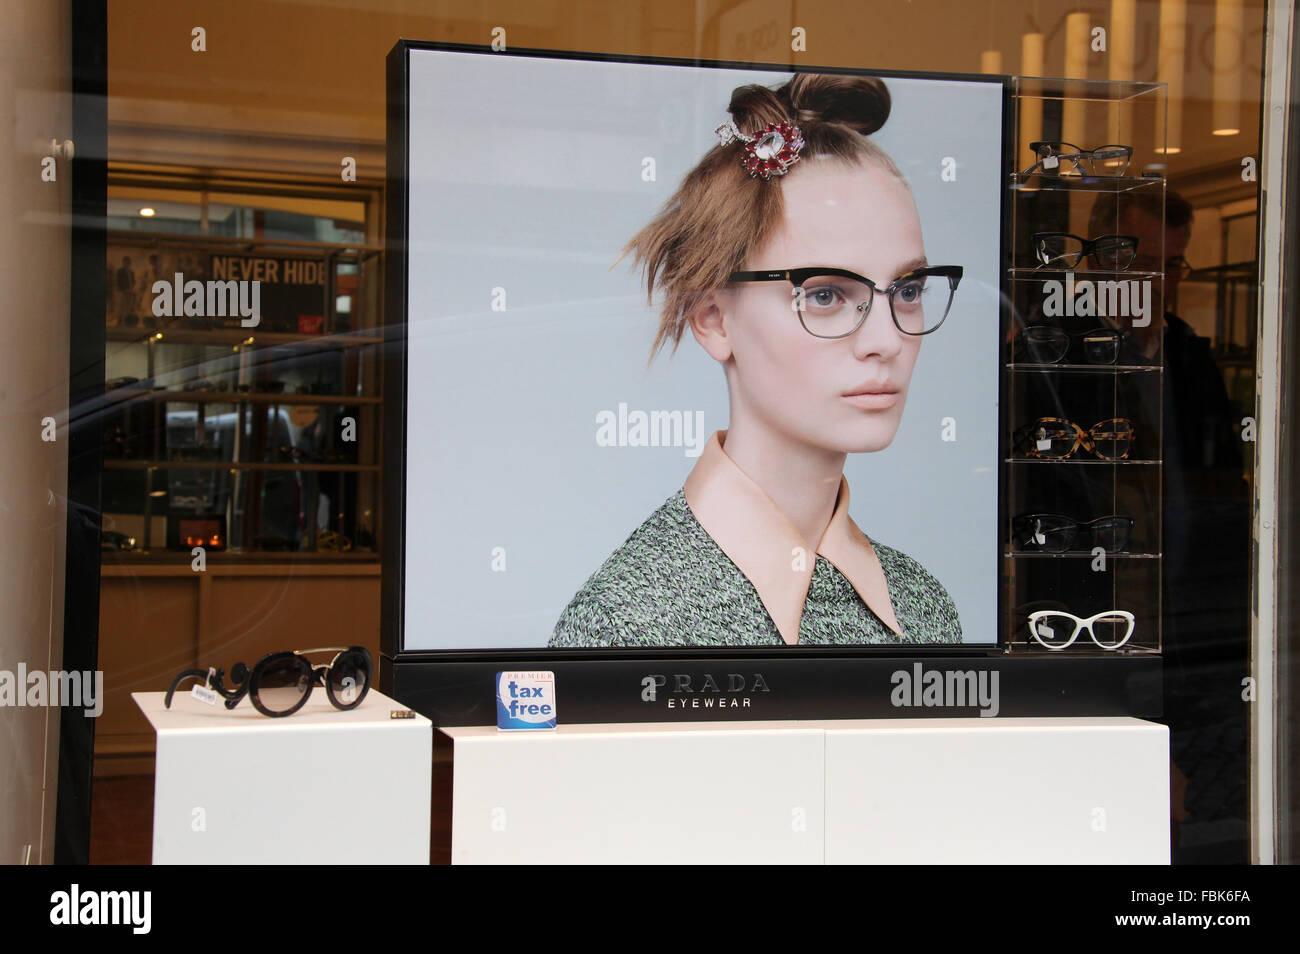 Prada Eyewear Advertisment in Portugal - Stock Image